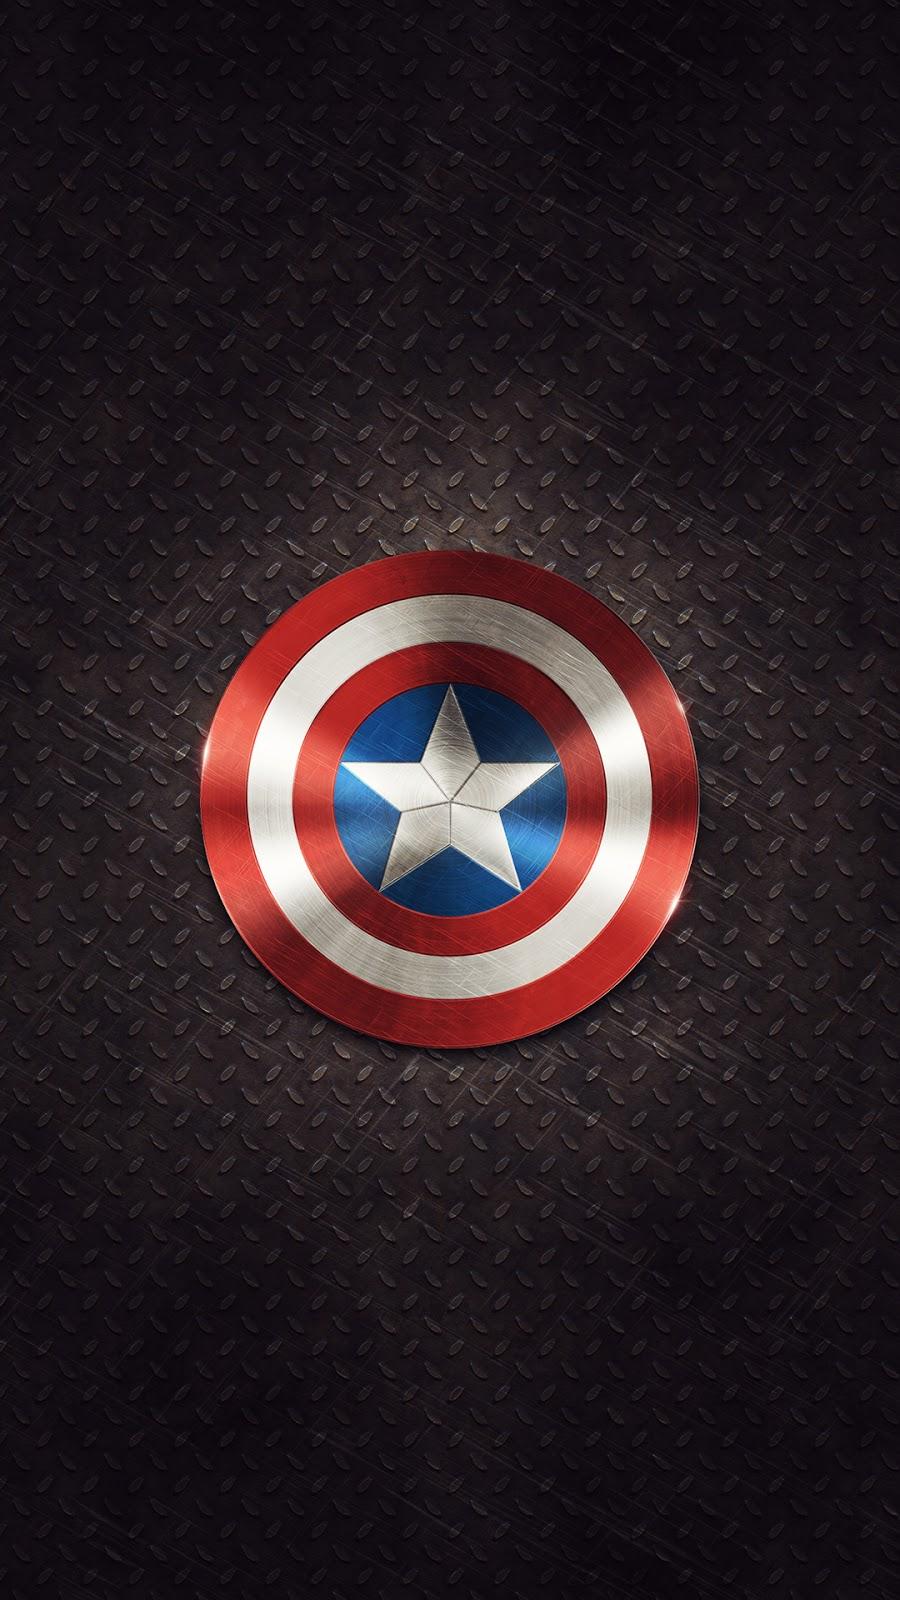 Wallpaper iphone latest - Captain America Shield Iphone 6 Plus Hd Wallpaper